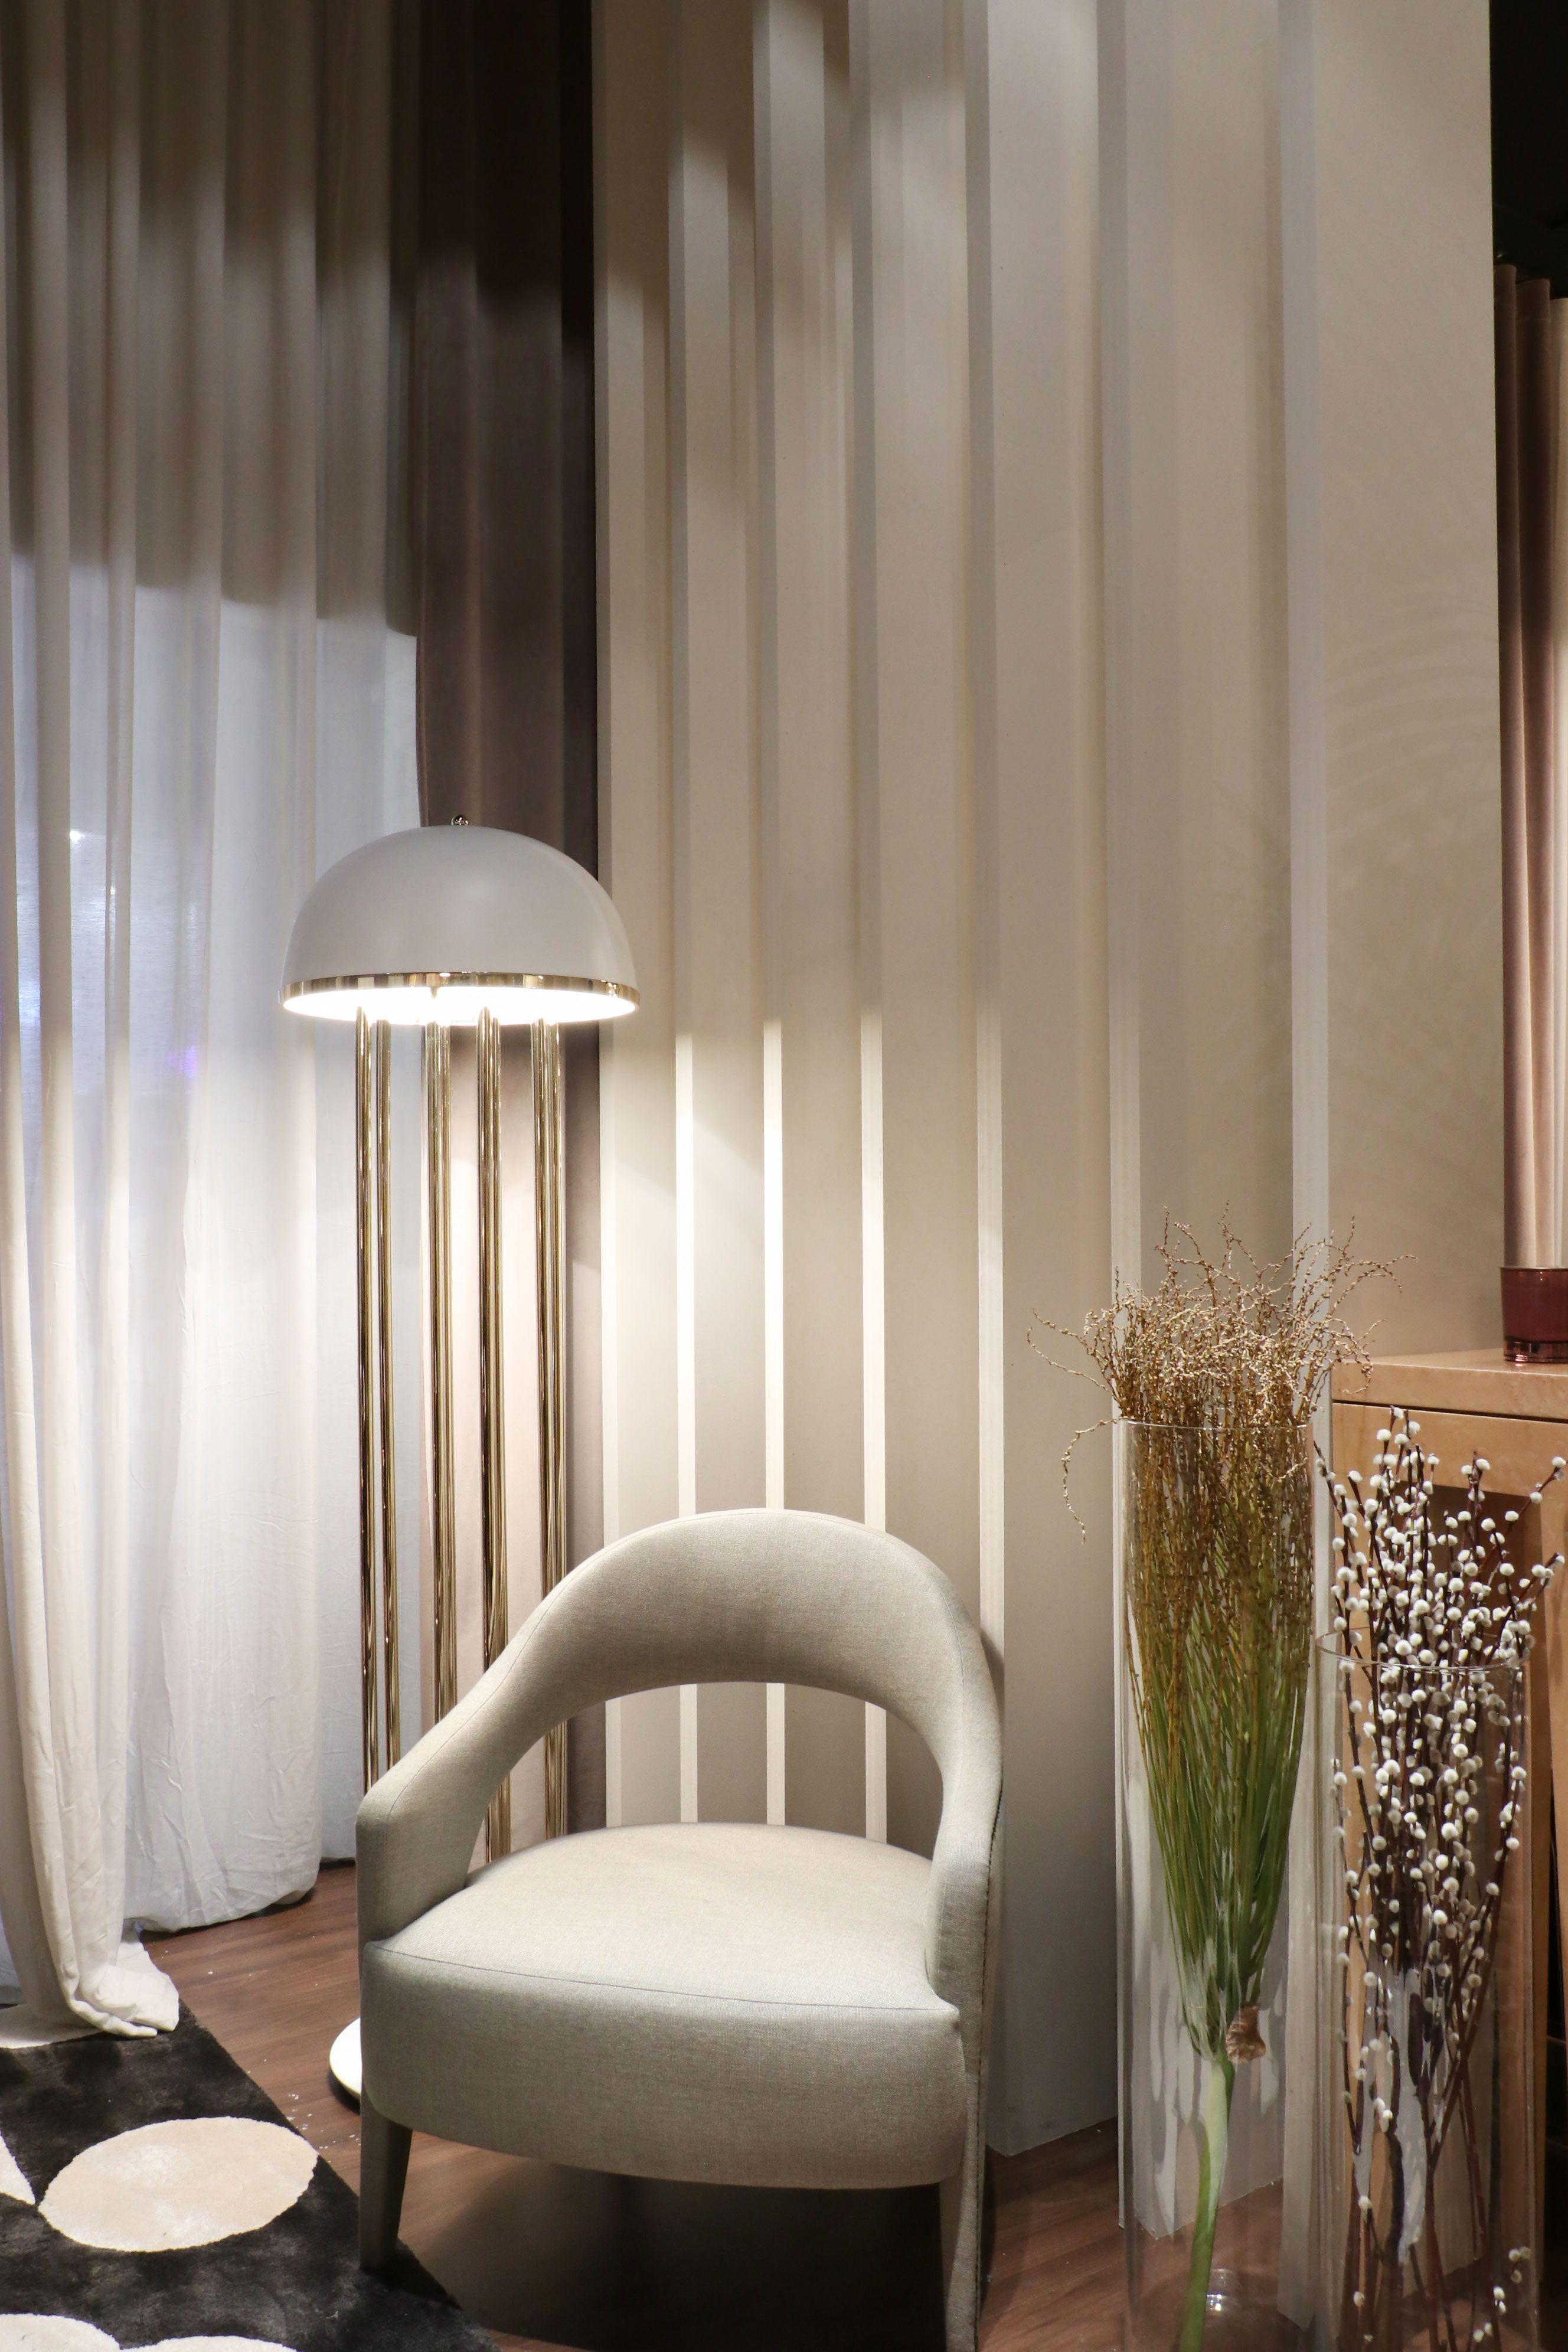 Interior Design Trends Presented At Maison Objet 2019 Luxury Interior Design Interior Design Luxury Interior